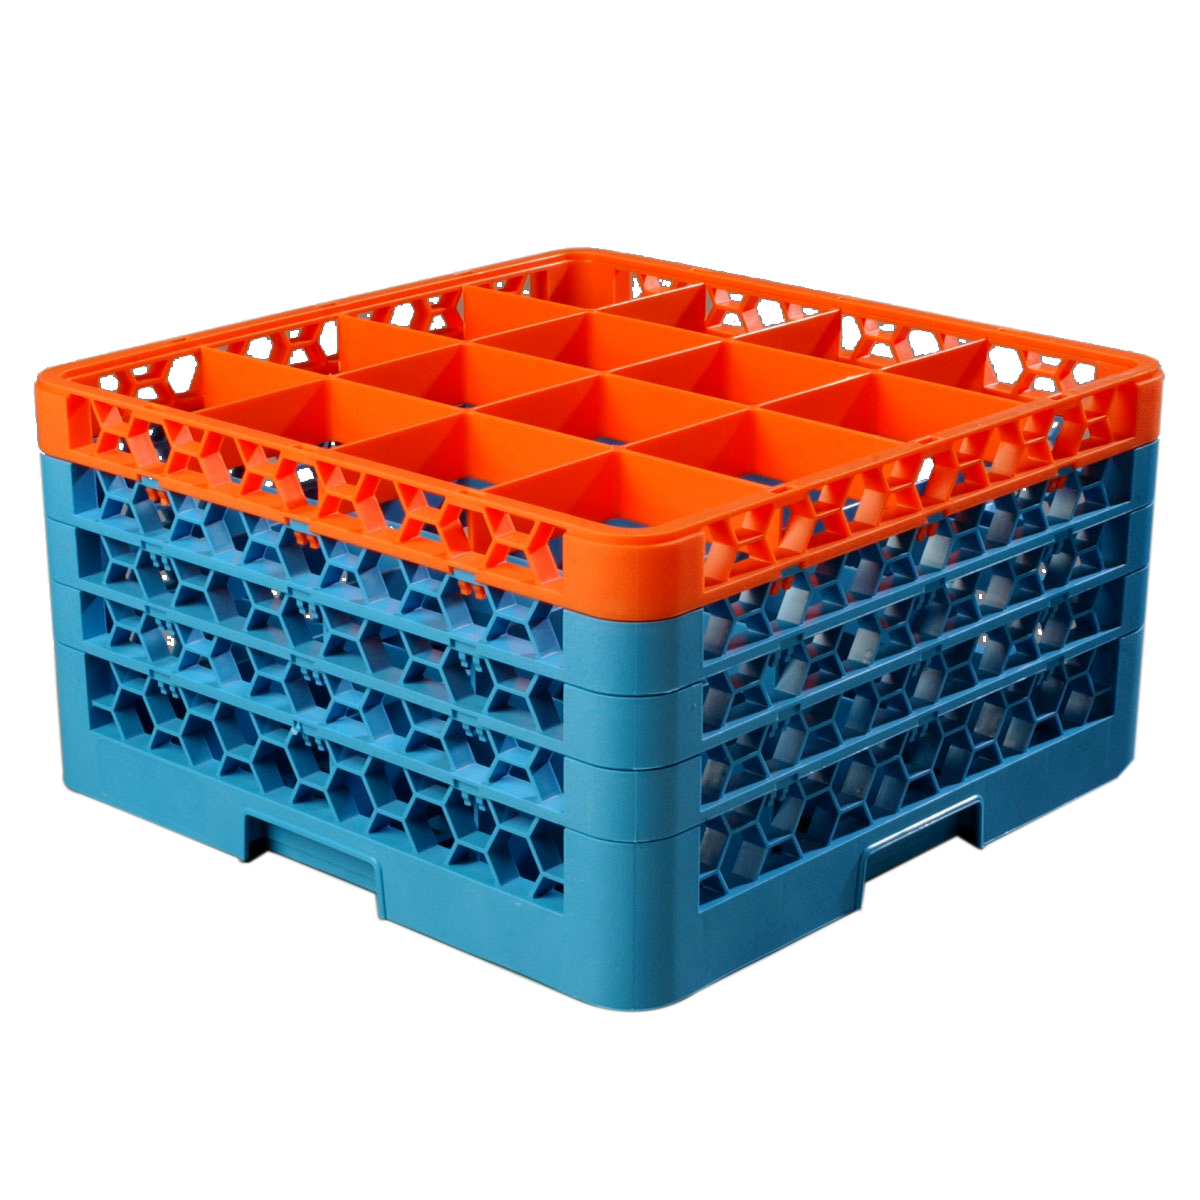 Carlisle RG16-4C412 dishwasher rack, glass compartment